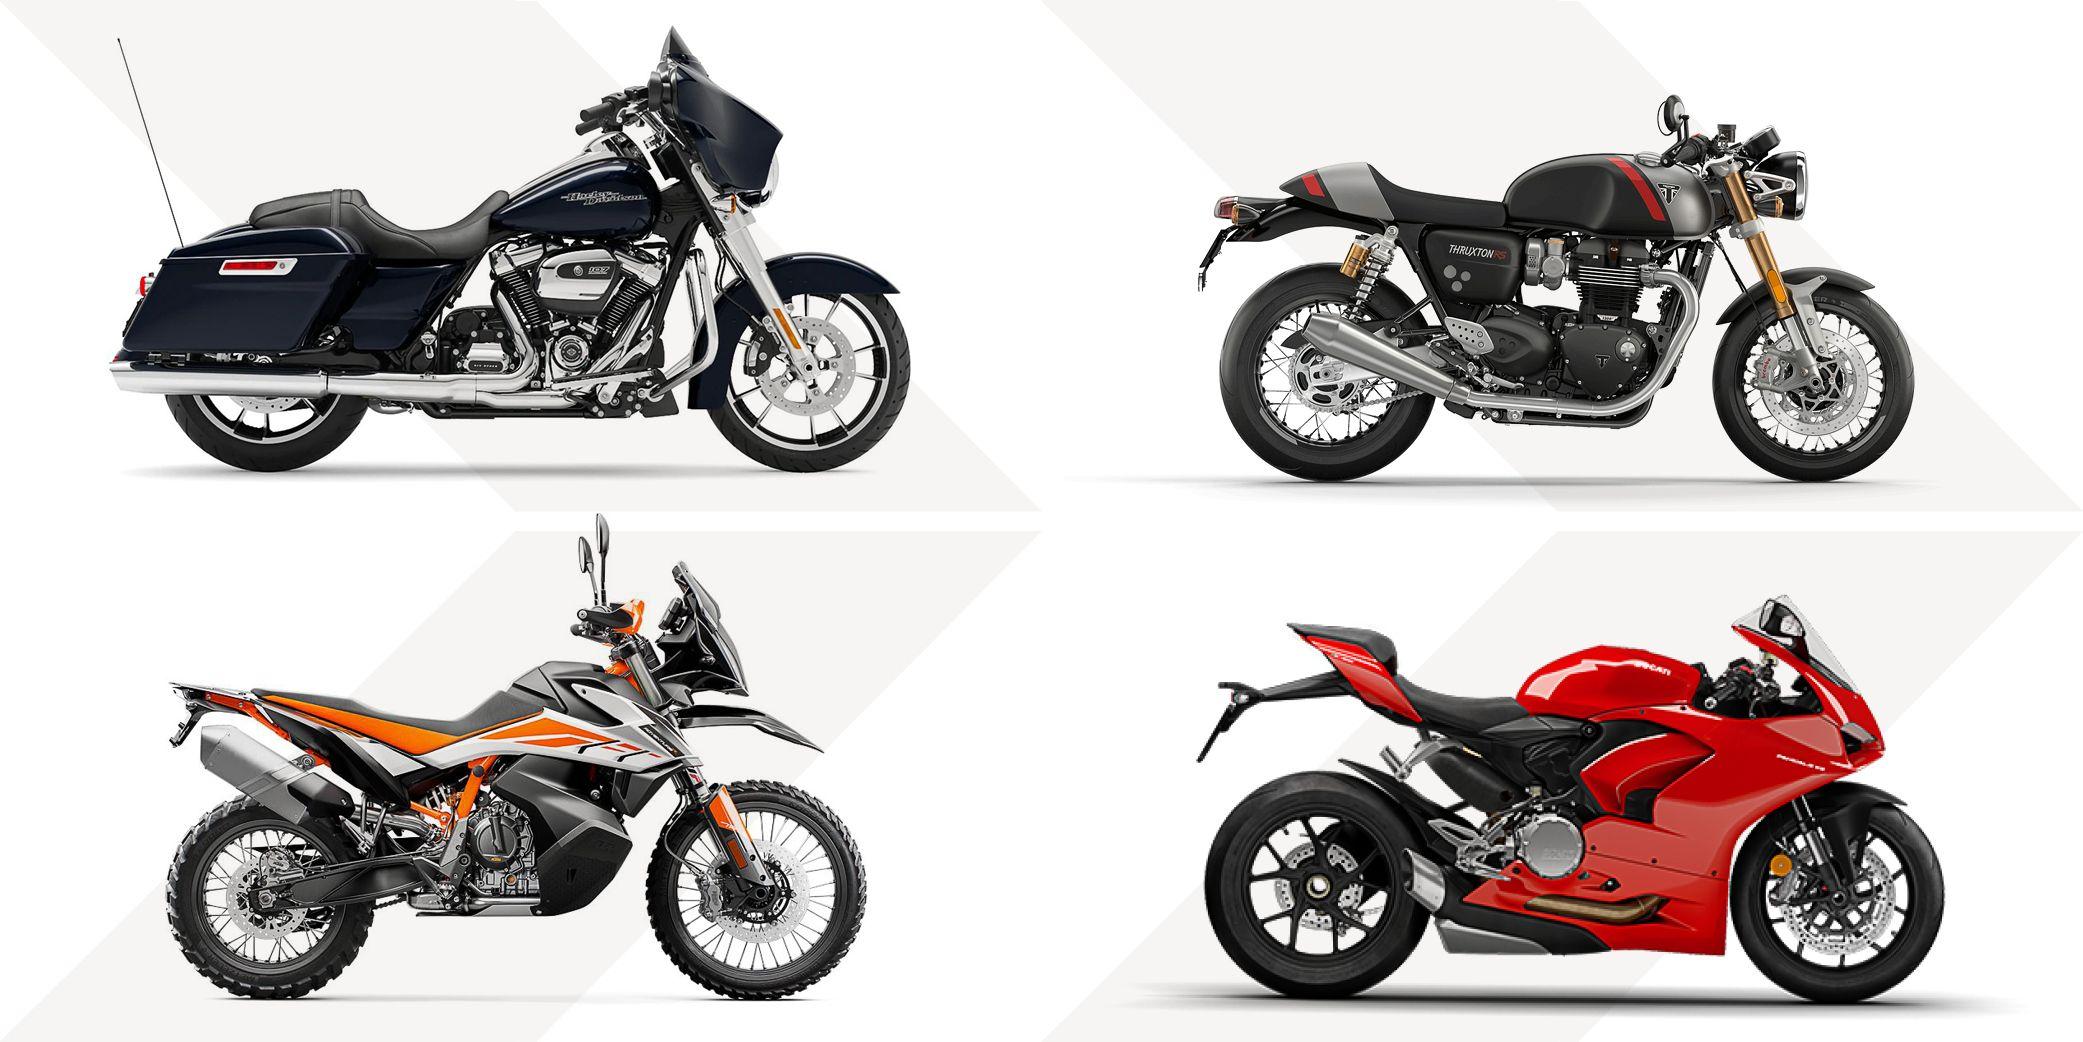 po-motorcycles-index-1586887896